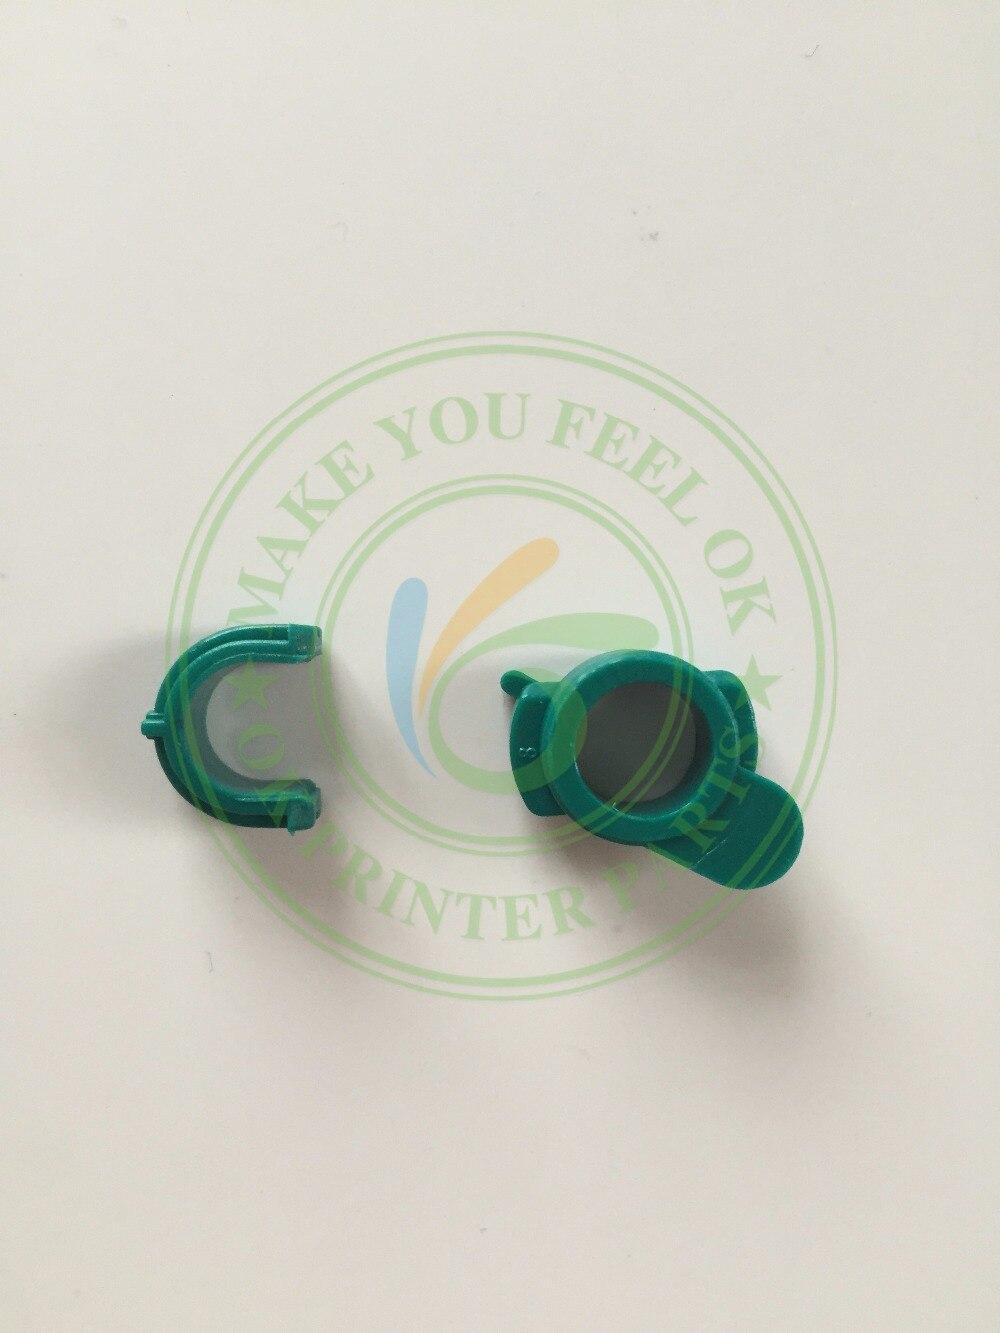 COMPATIBLE RC1-3361-000 RC1-3362-000 Pressure roller Bushing Lower Roller Bushing for HP 4200 4250 4300 4350 compatible new fuser gear for hp 4250 4300 4350 rc1 3325 000 rc1 3324 000 10 pcs per lot